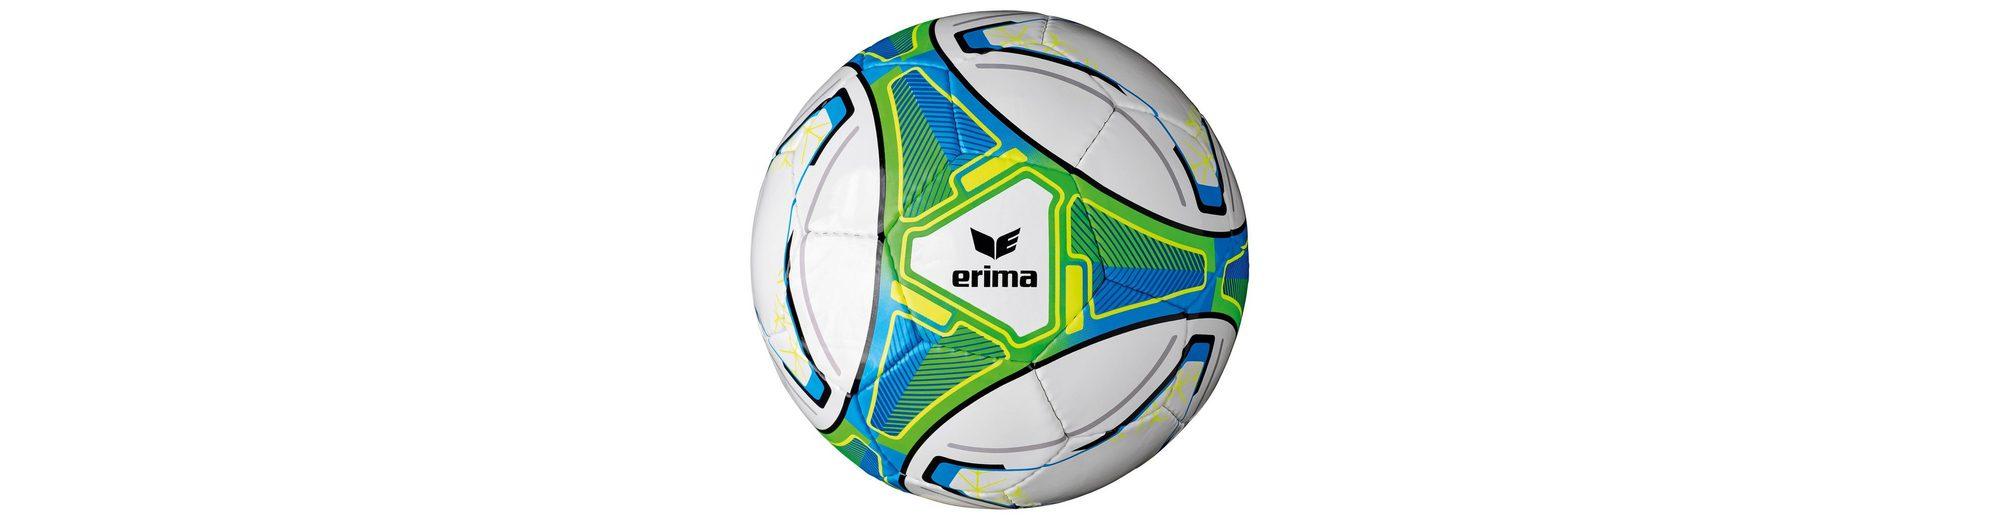 ERIMA Allround Lite 290 Trainingsball